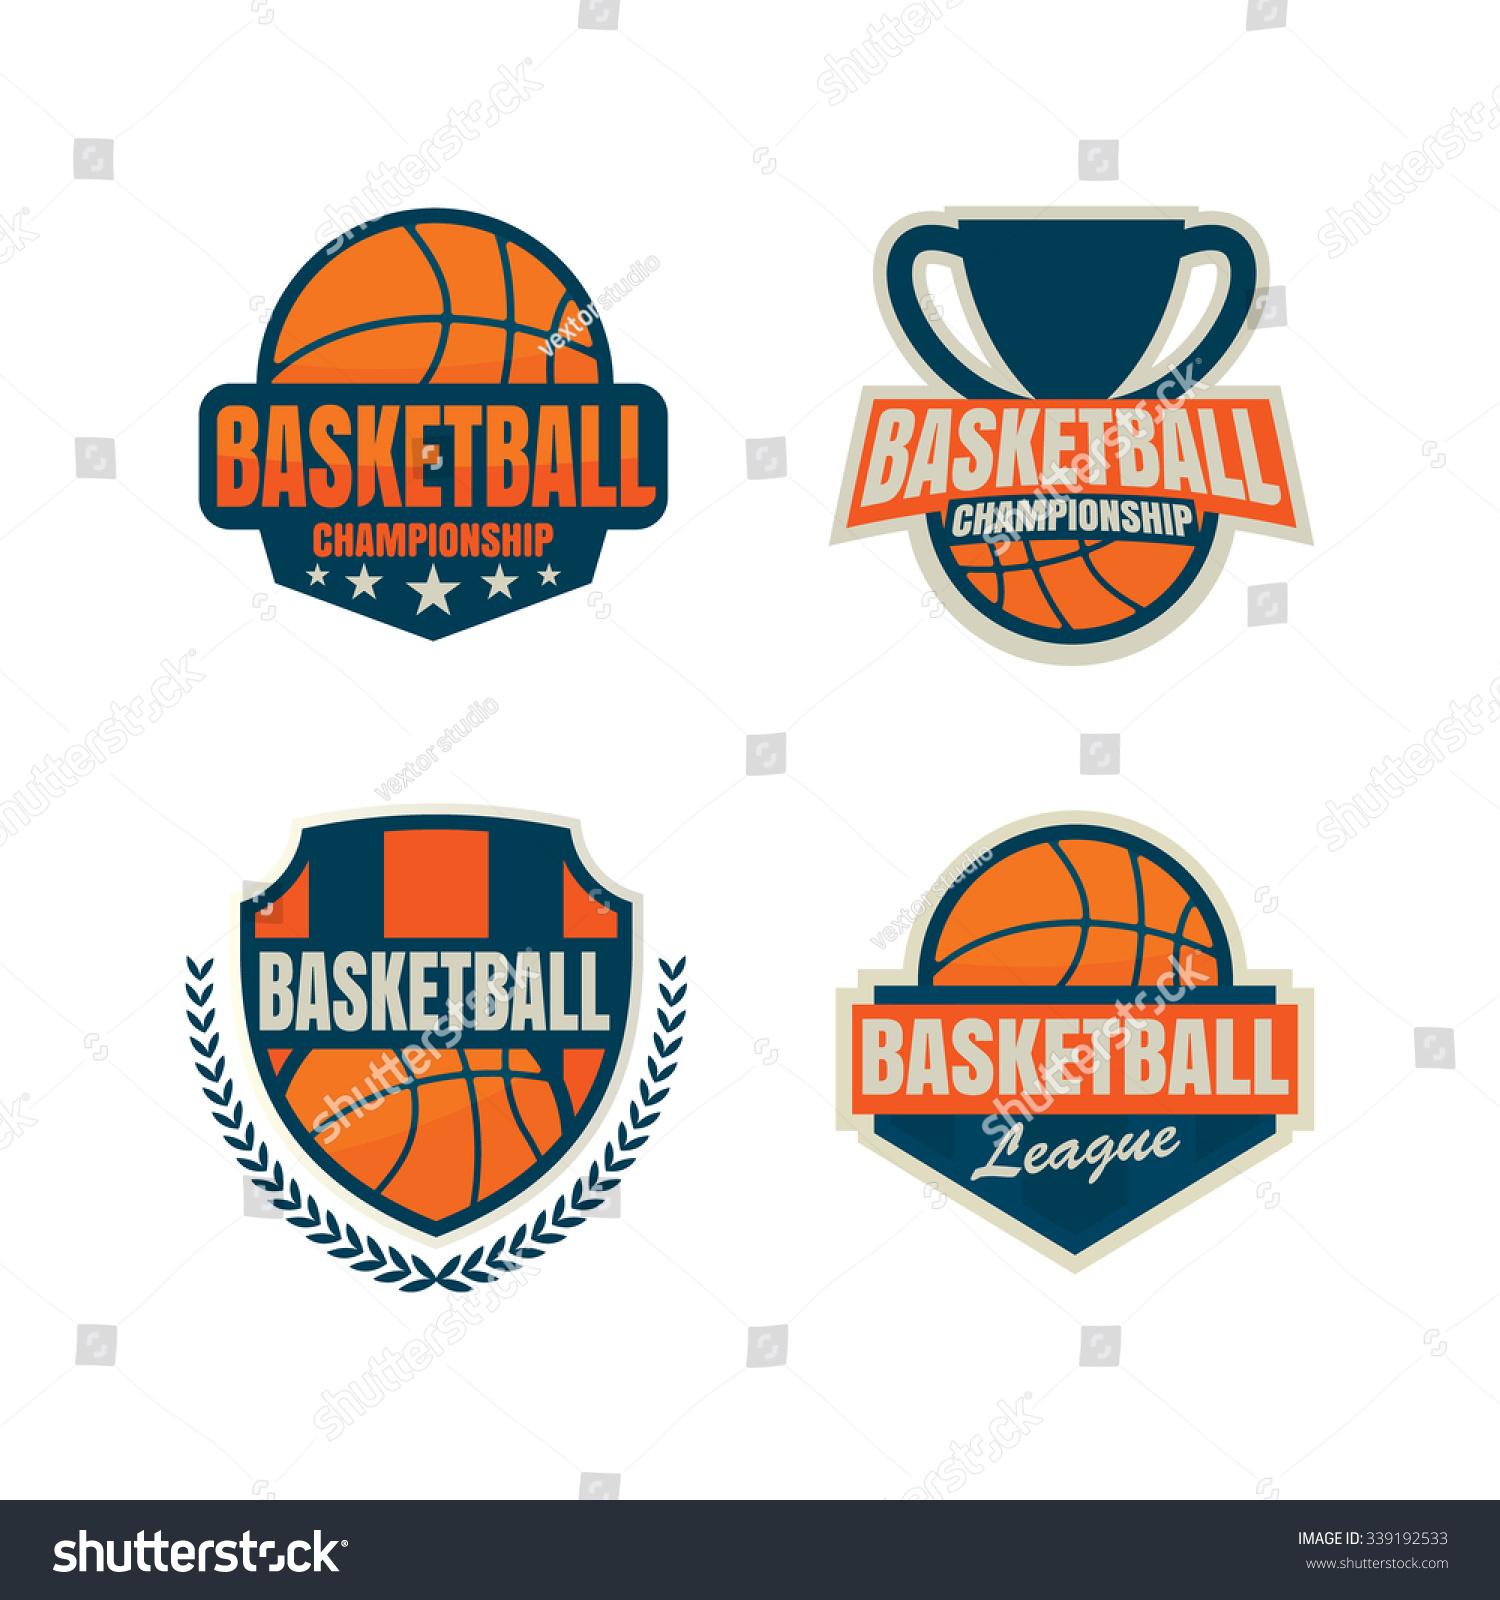 Fantastisch Basketball Turnier Vorlage Galerie - Entry Level Resume ...